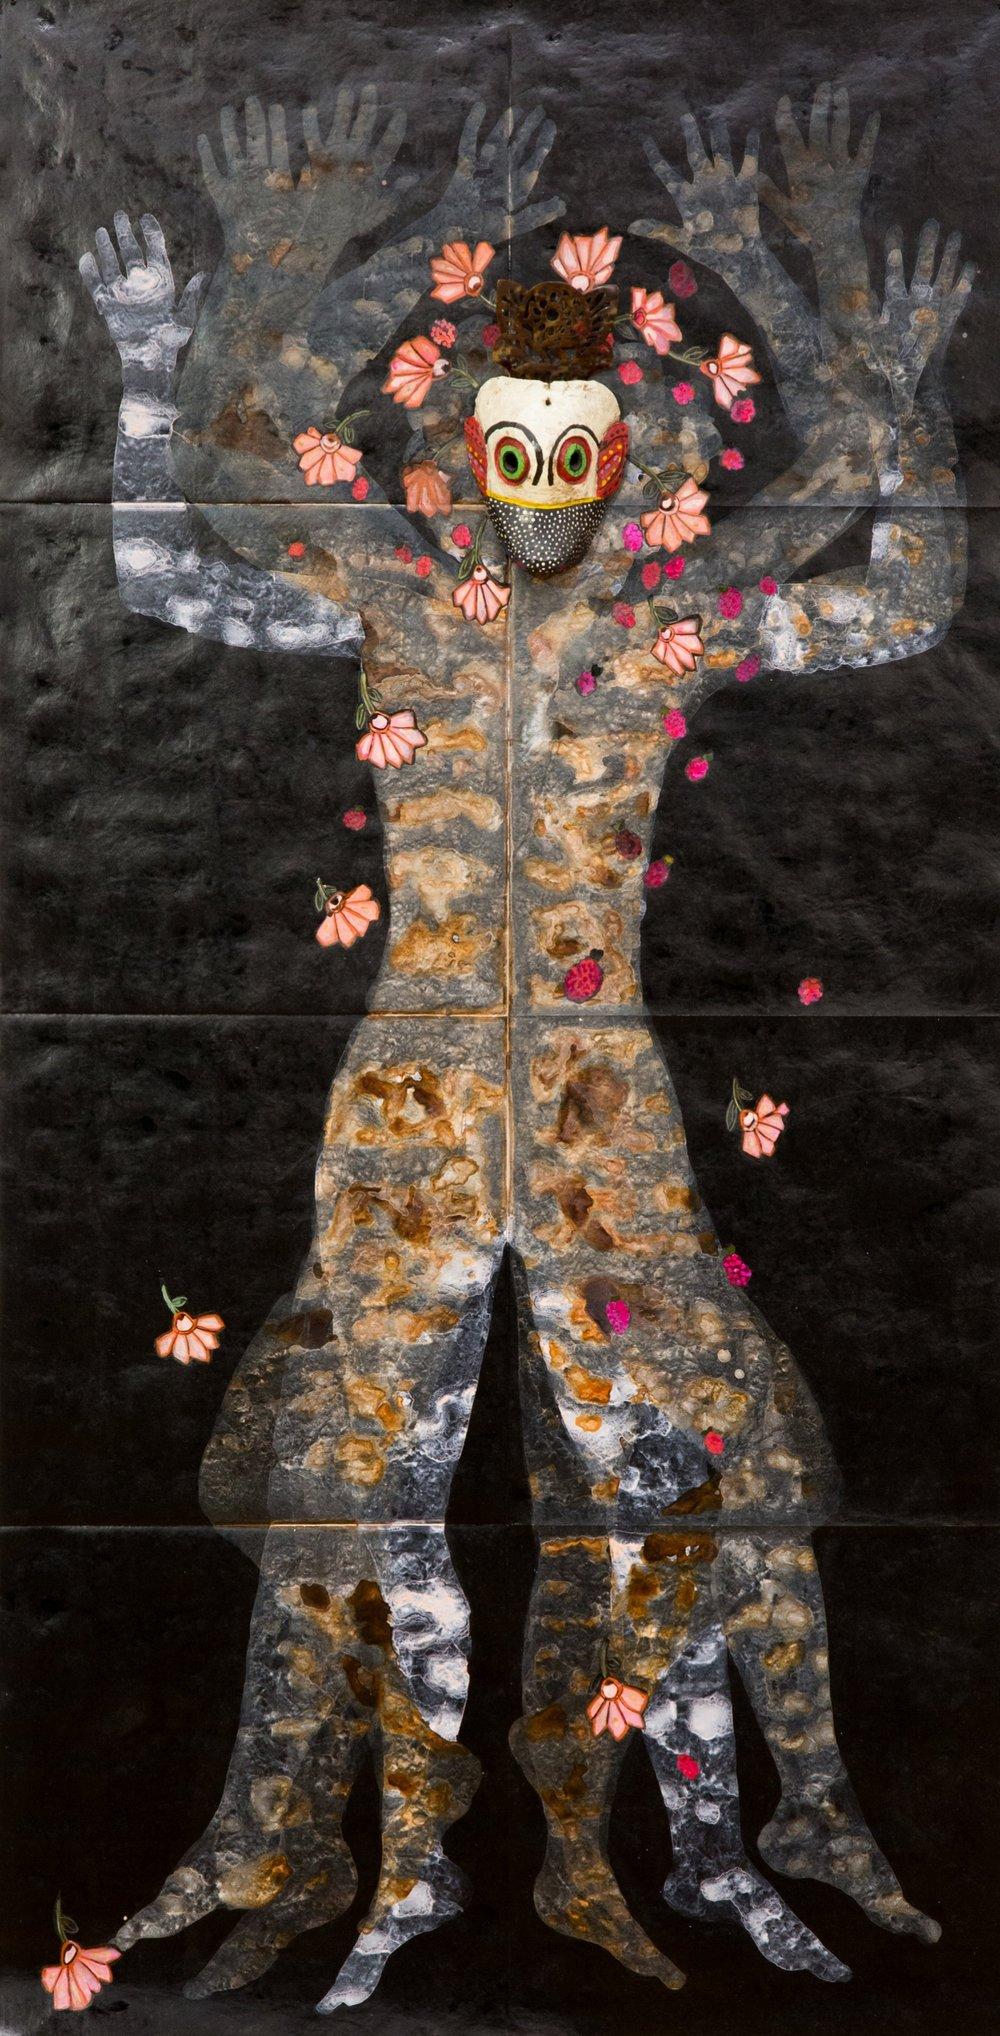 Nancy Friedemann-Sánchez, China Cambuja , from the Casta Paintings, 2017, mopa mopa, tyvek, and readymade. Photo credit Dana Damewood